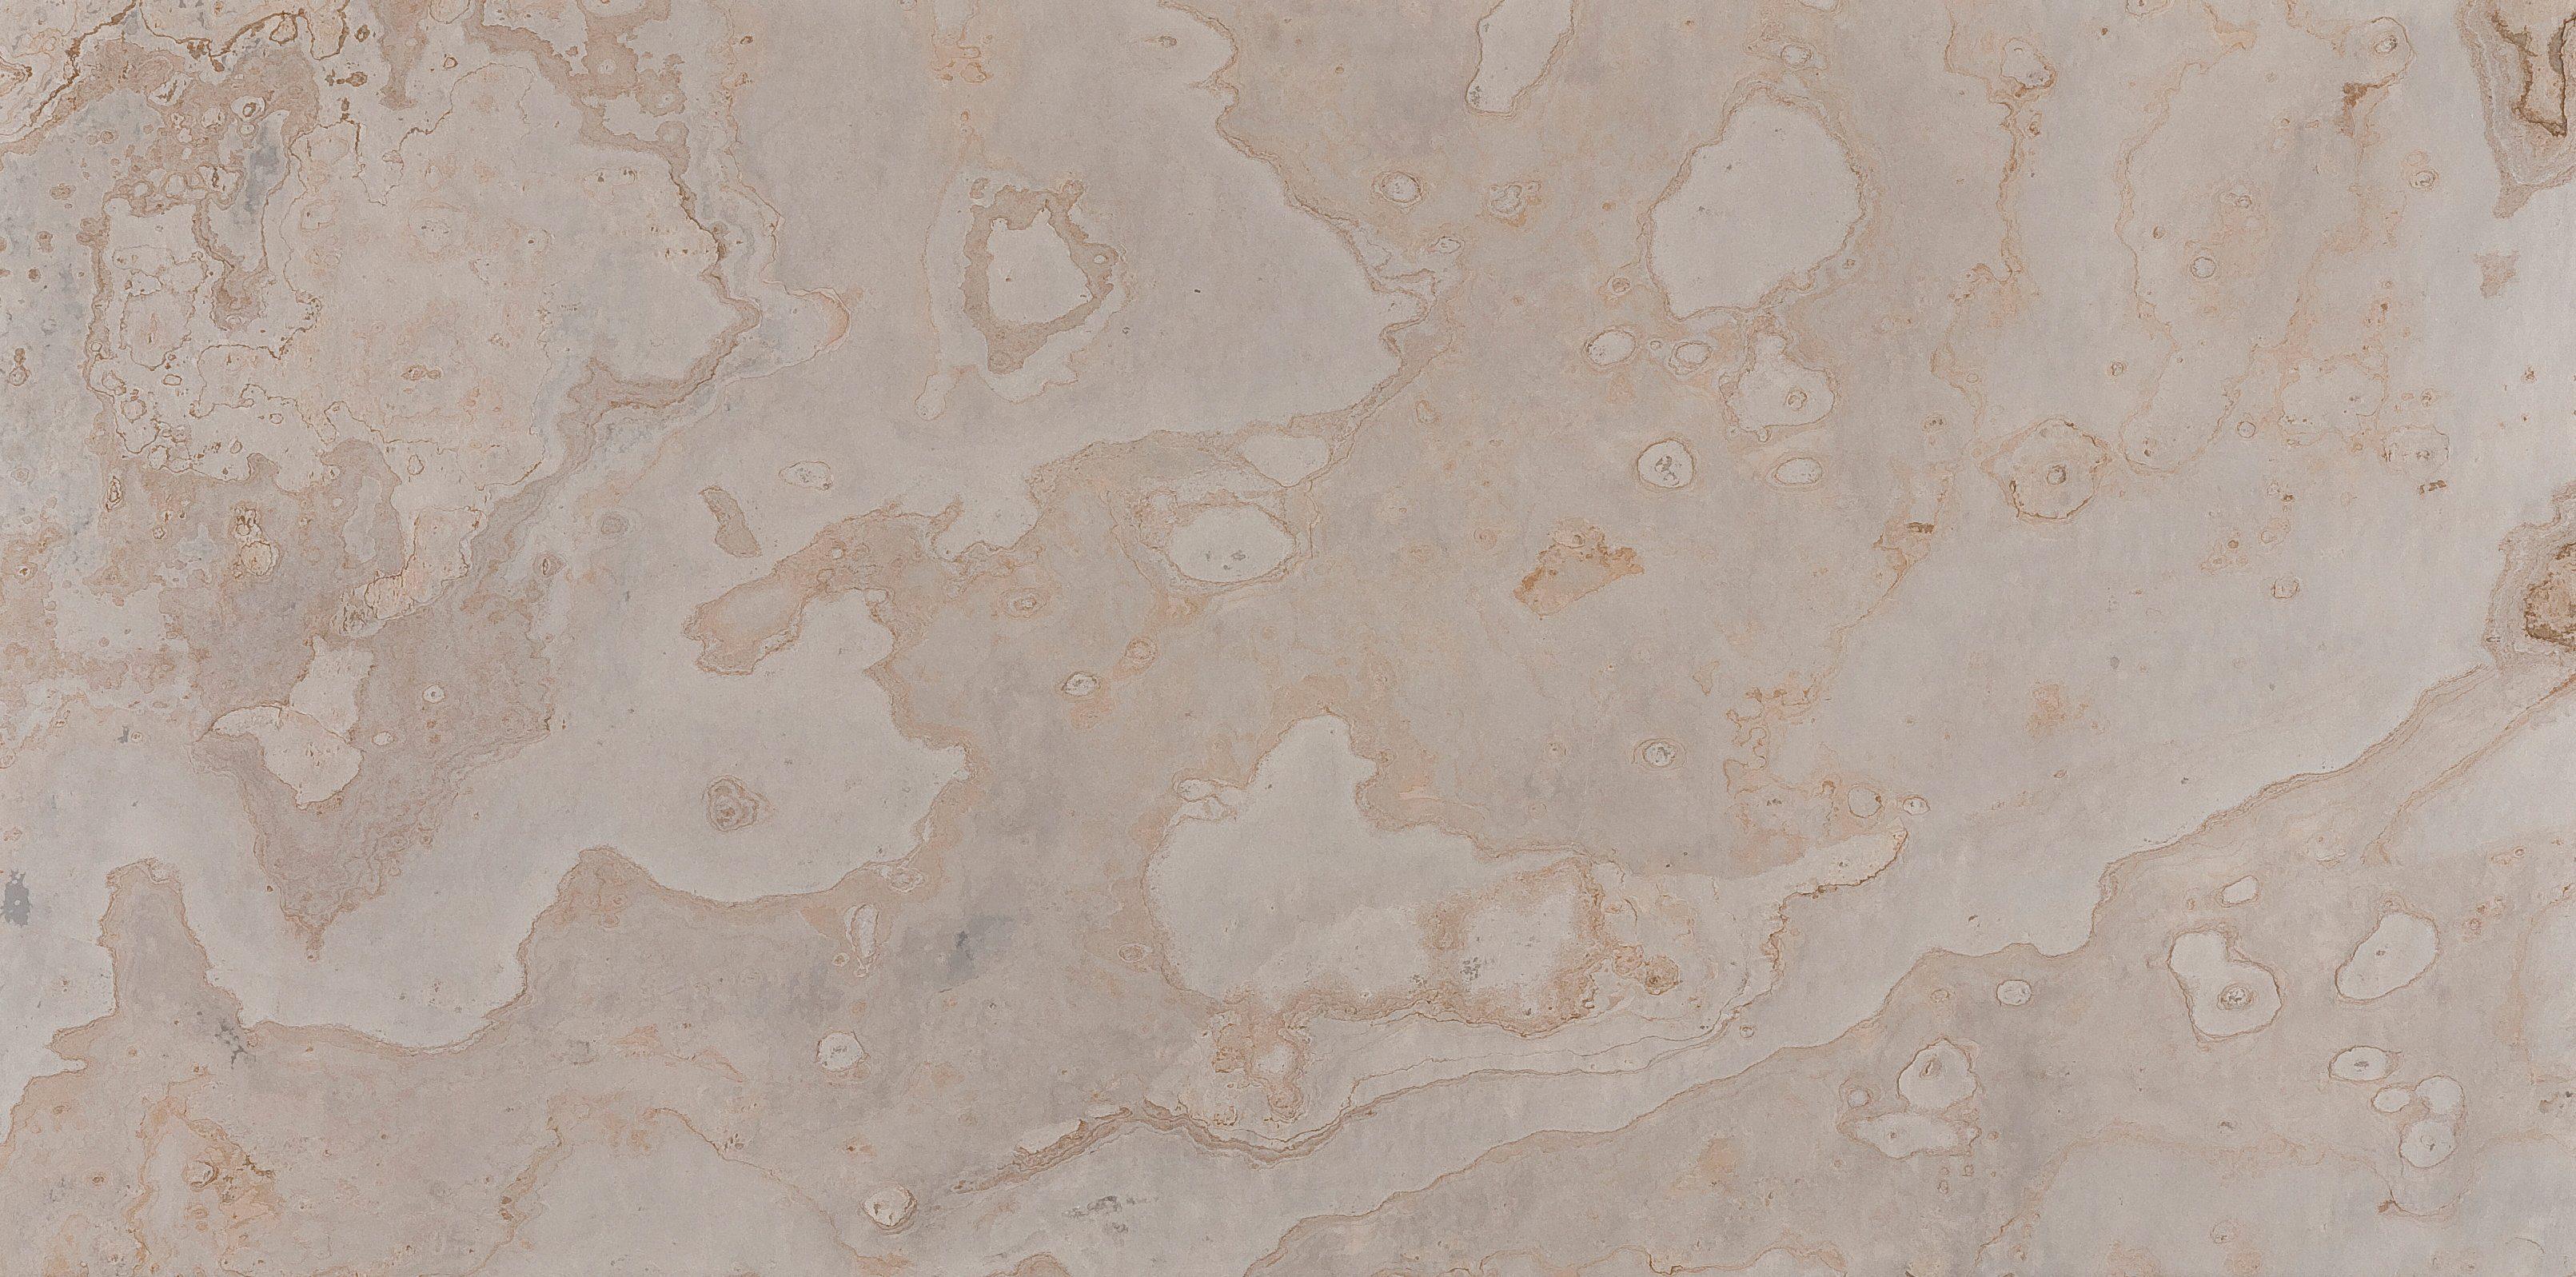 SLATE LITE Dekorpaneele »Tan«, Naturstein, Stärke 1,5 mm, 60 x 30 cm, 6er Box